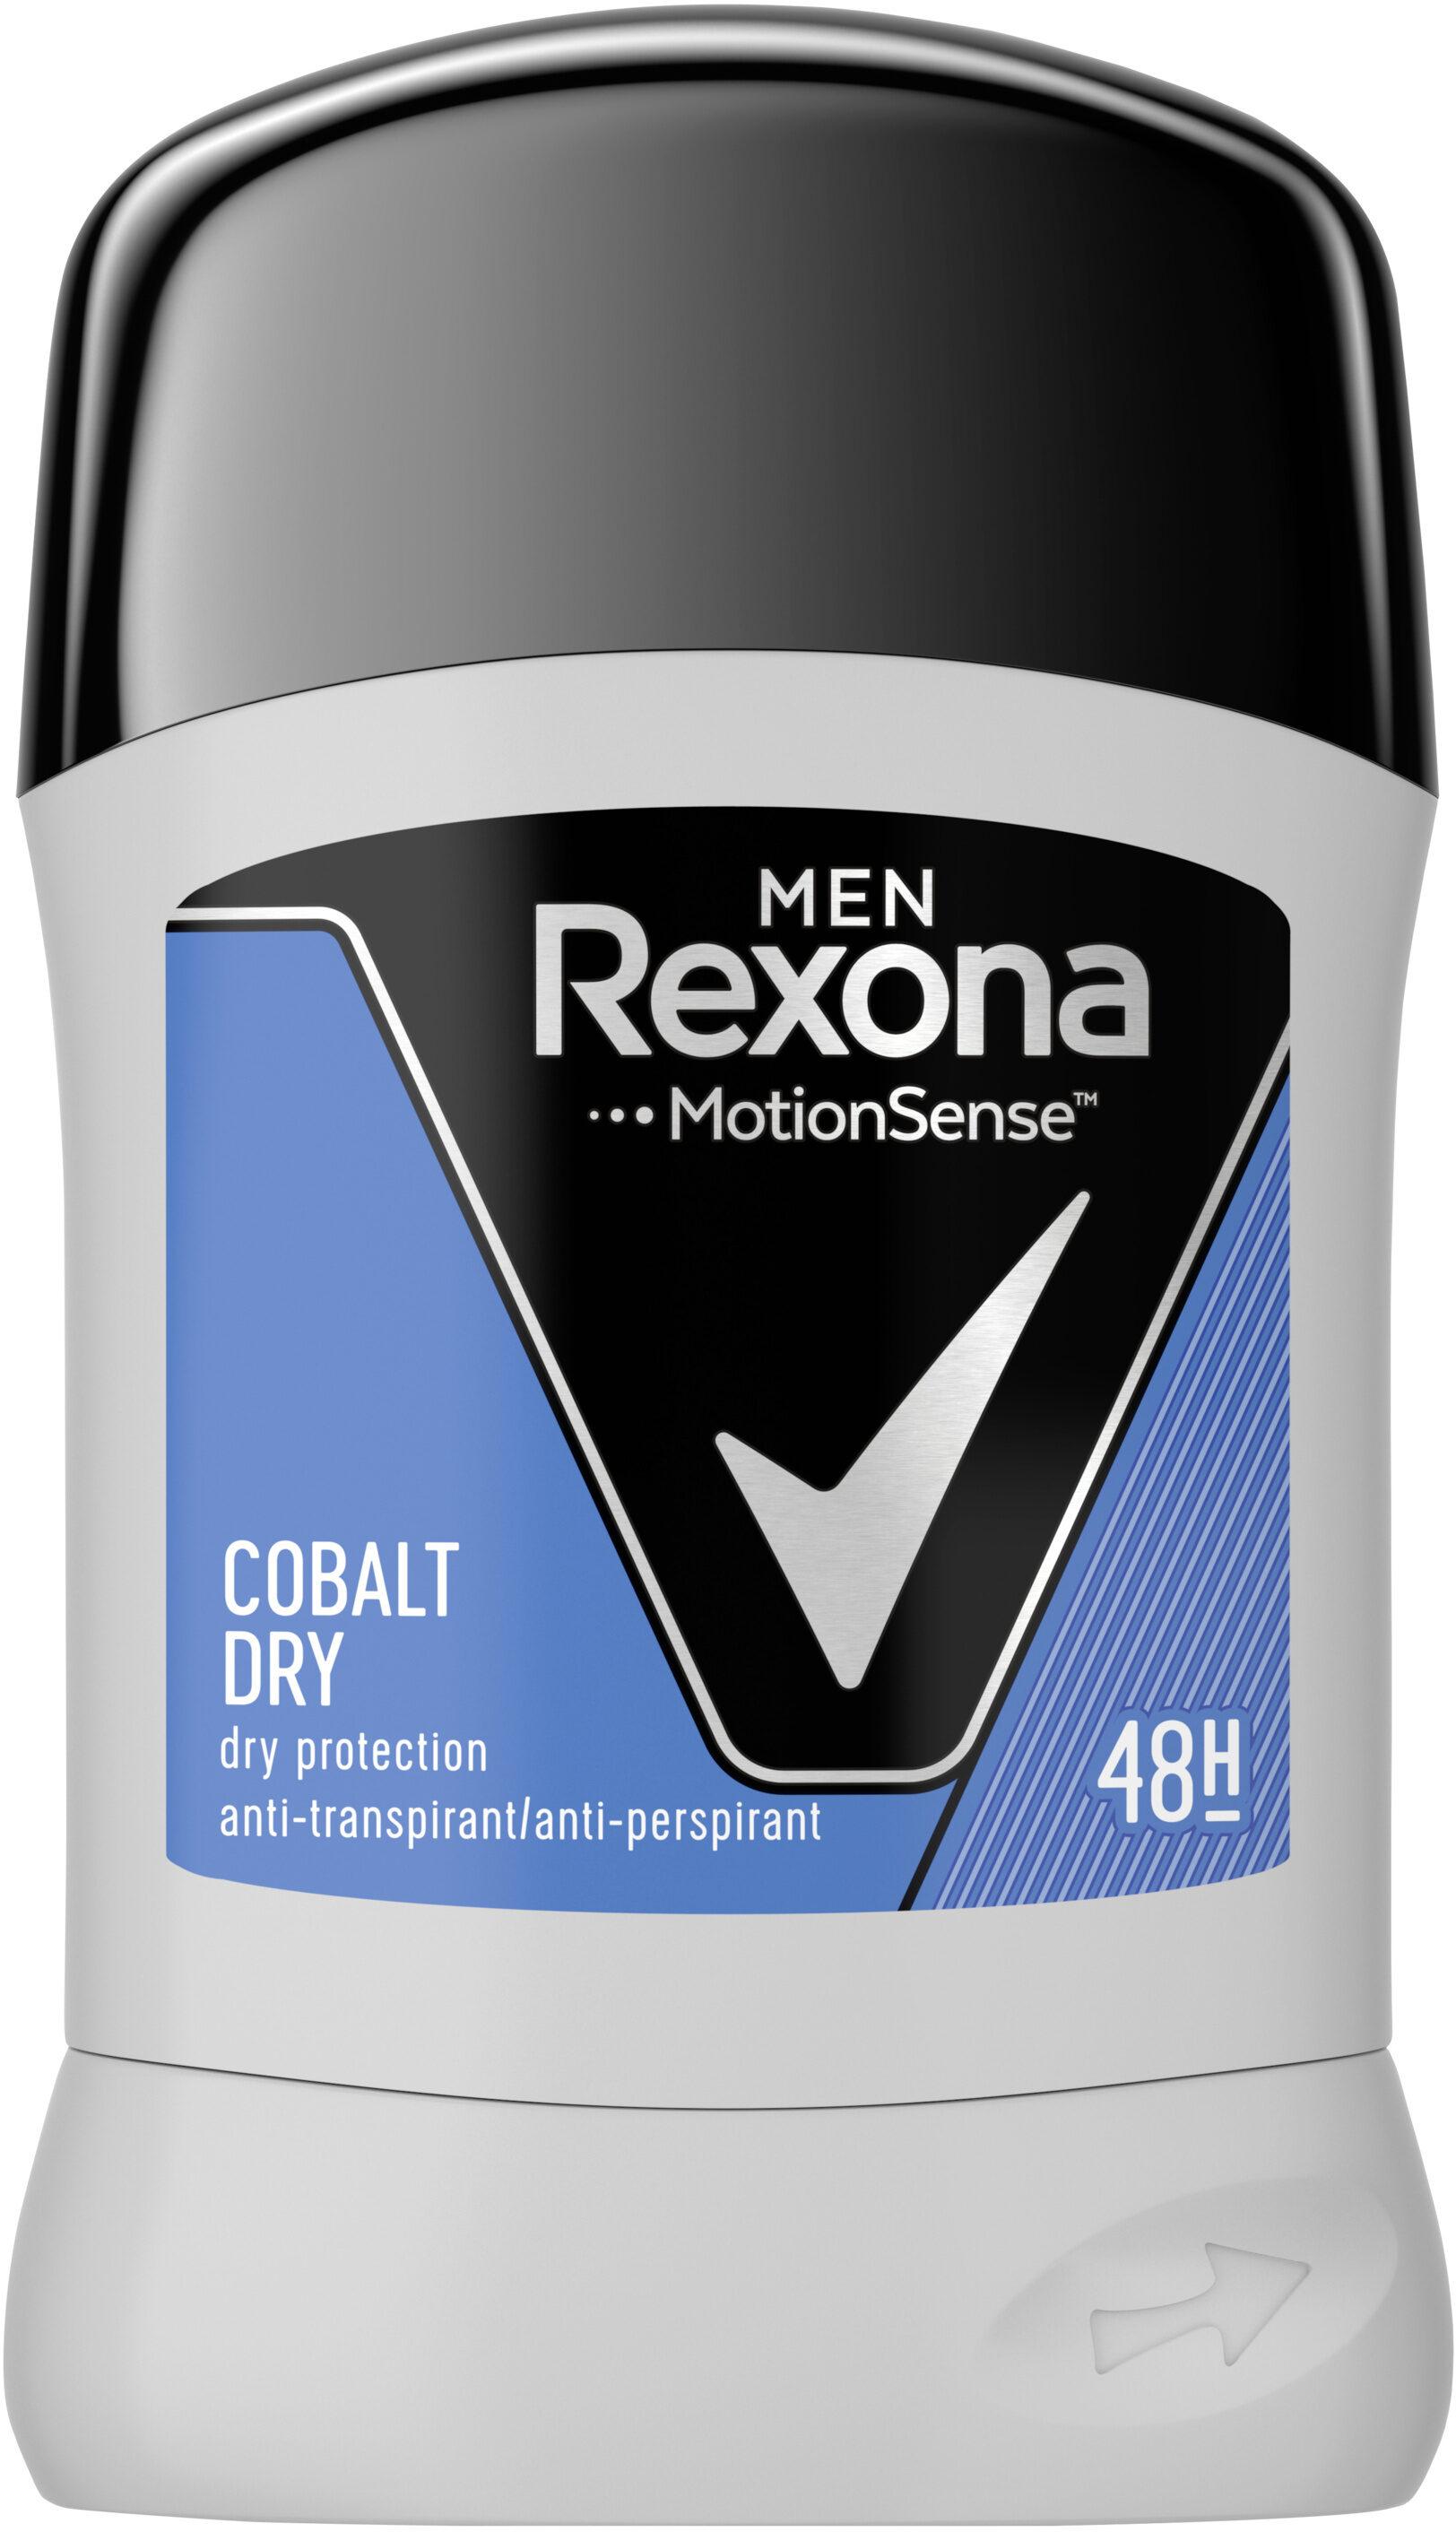 REXONA MEN Stick Anti-Transpirant Cobalt Dry - Produit - fr